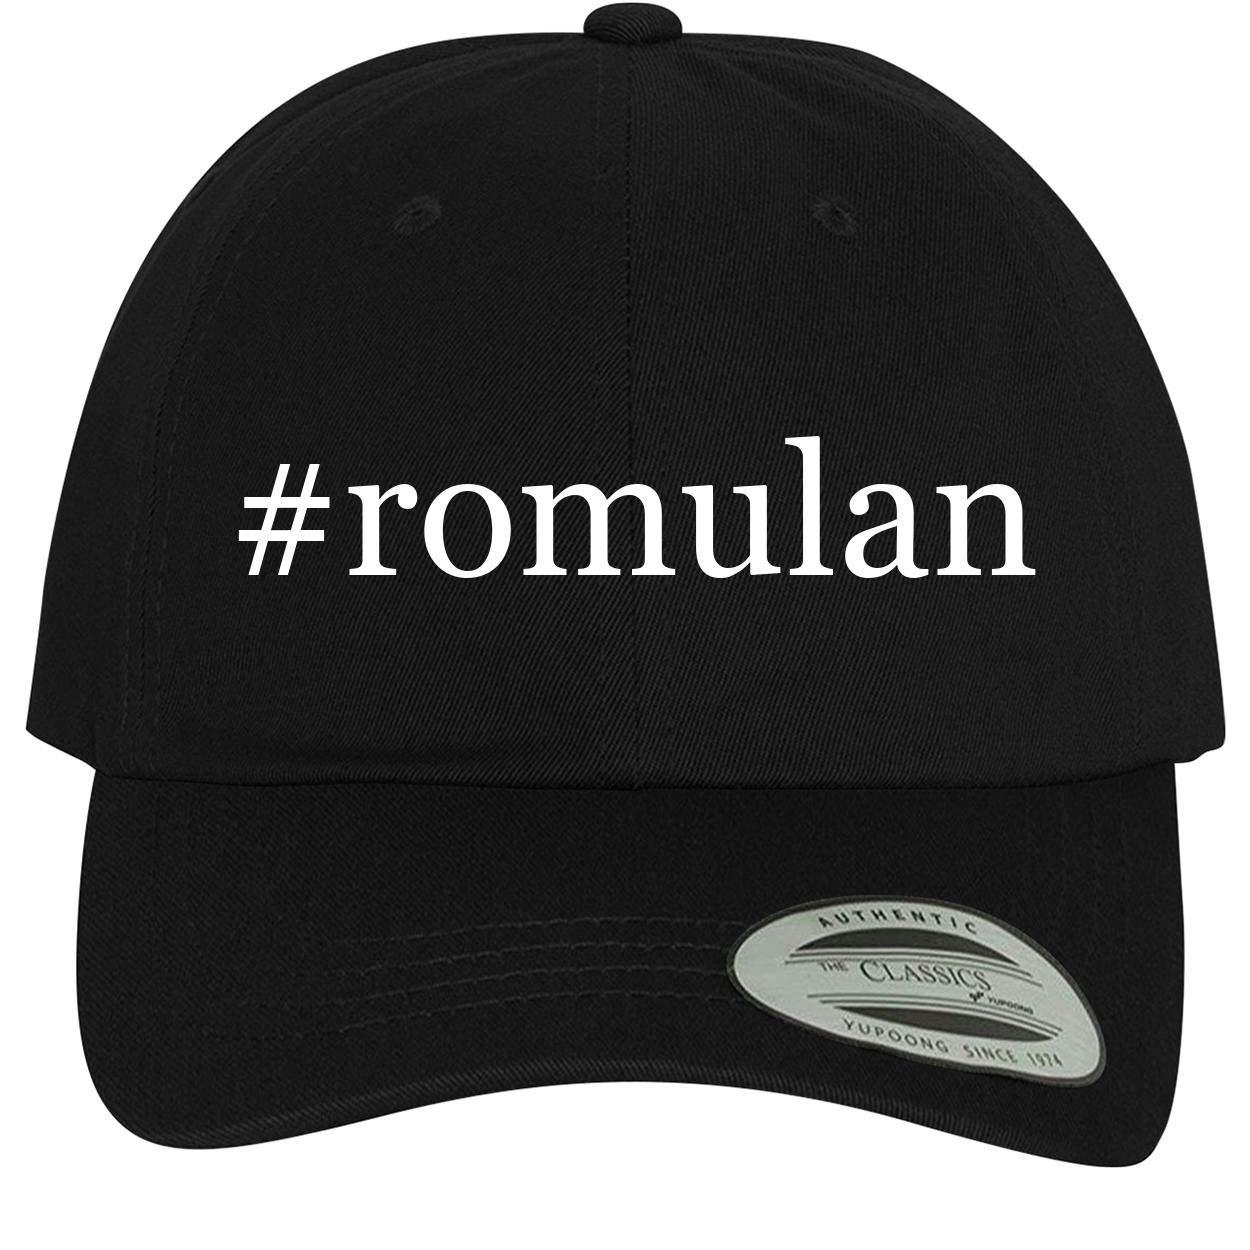 BH Cool Designs #Romulan Comfortable Dad Hat Baseball Cap